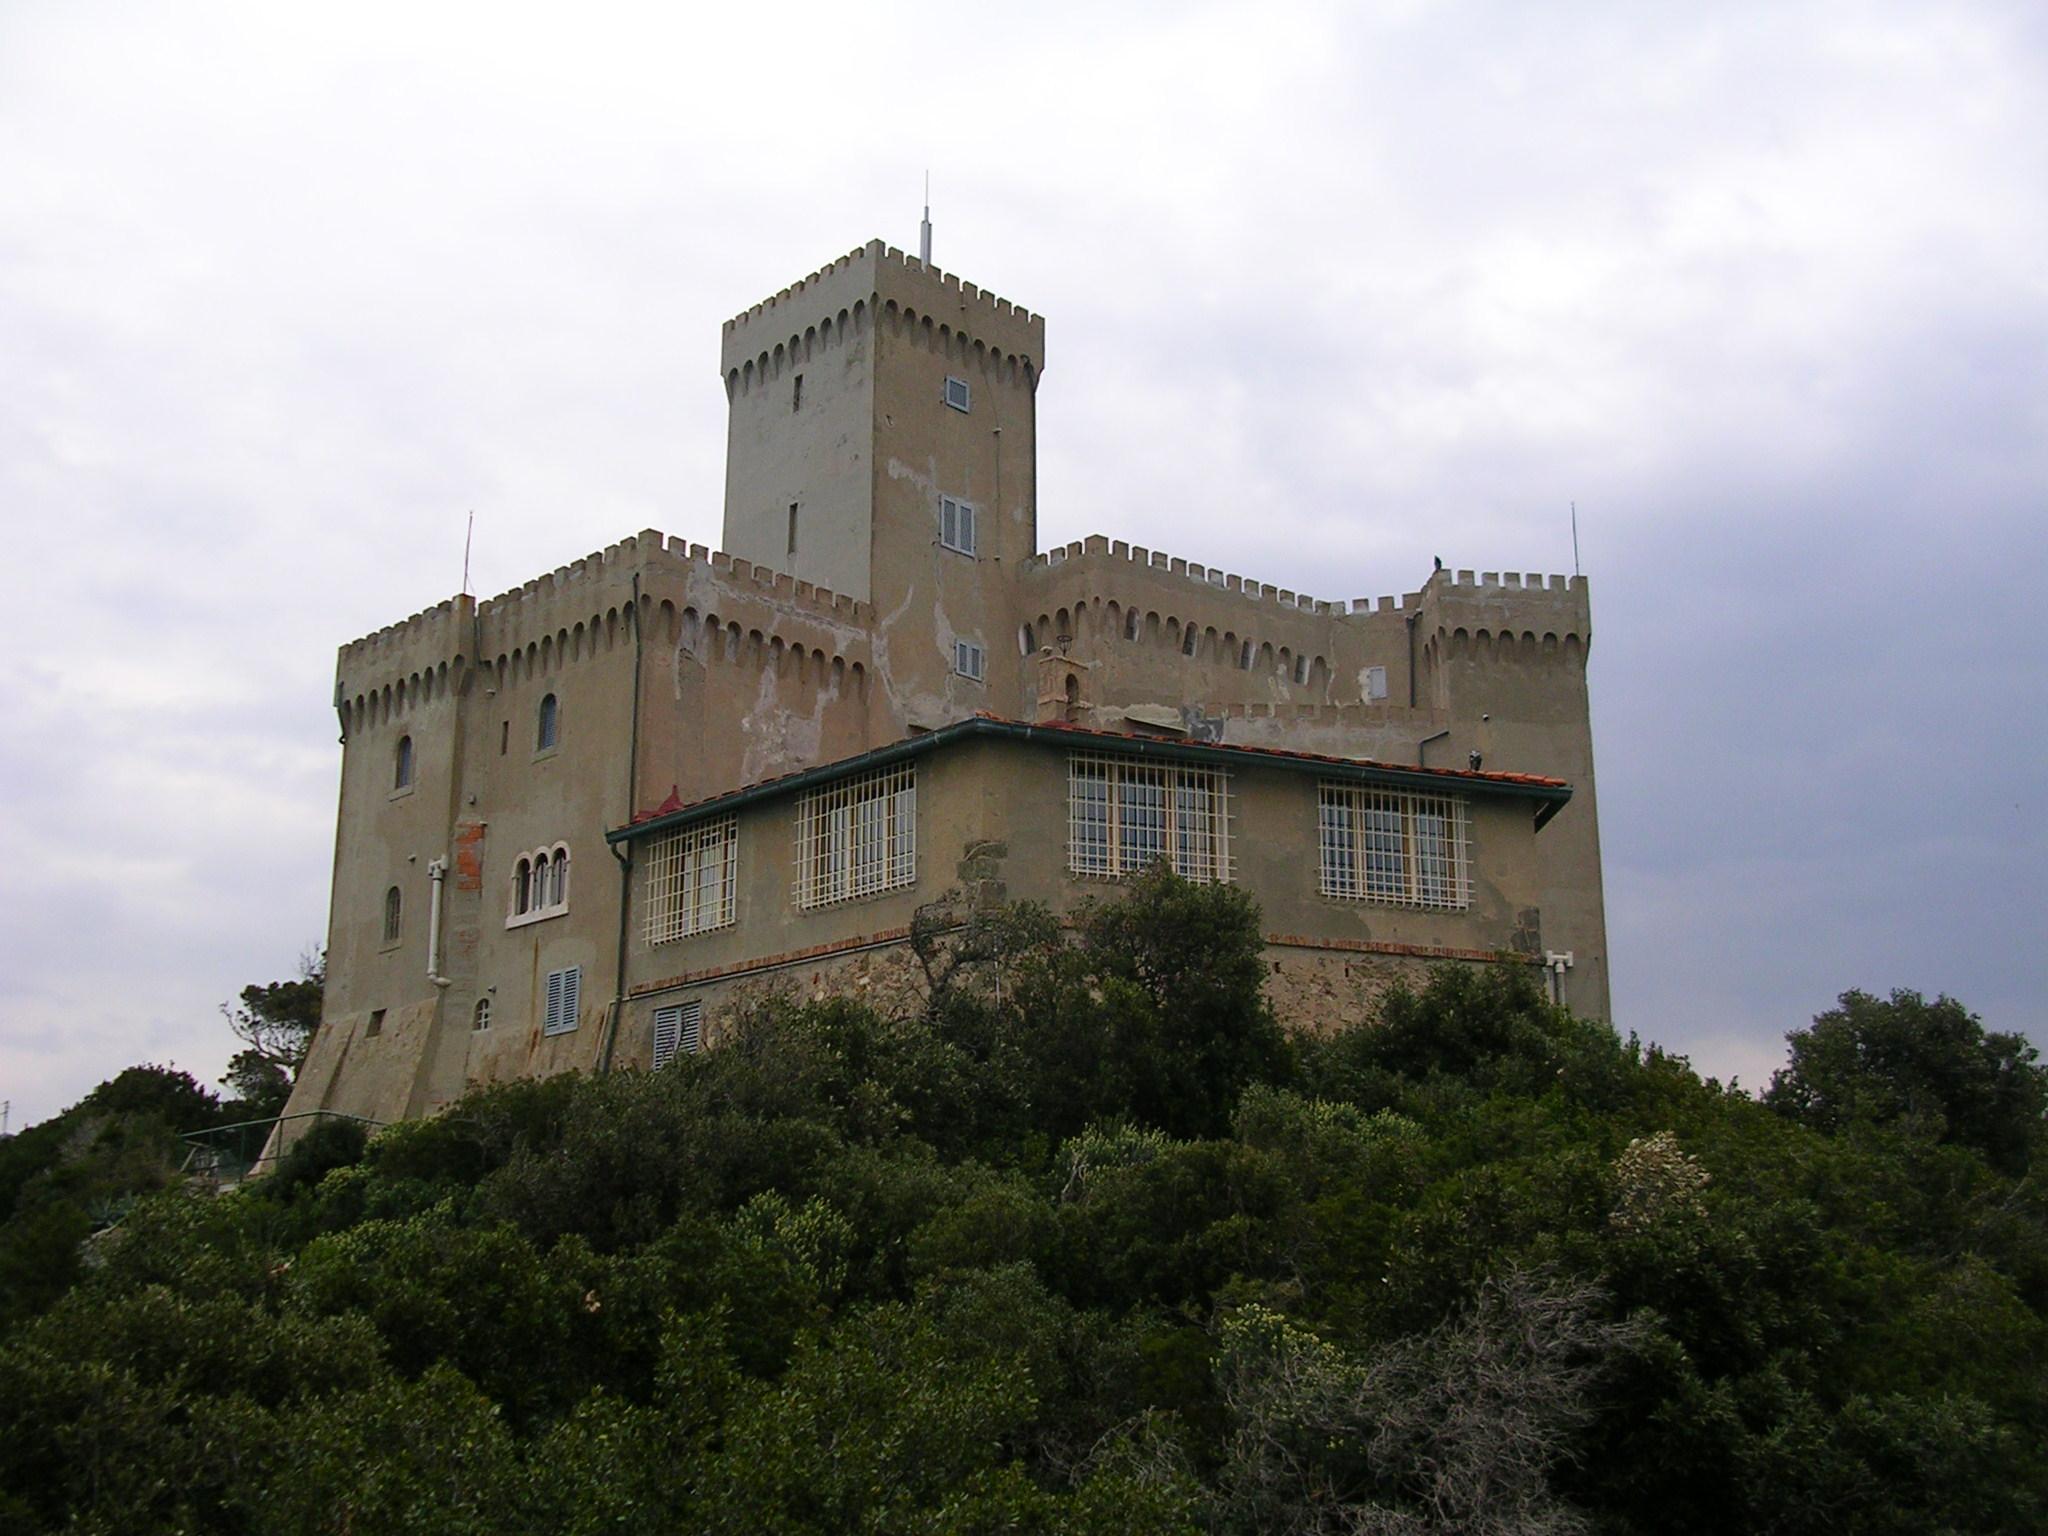 File:Castello Sonnino.jpg - Wikimedia Commons